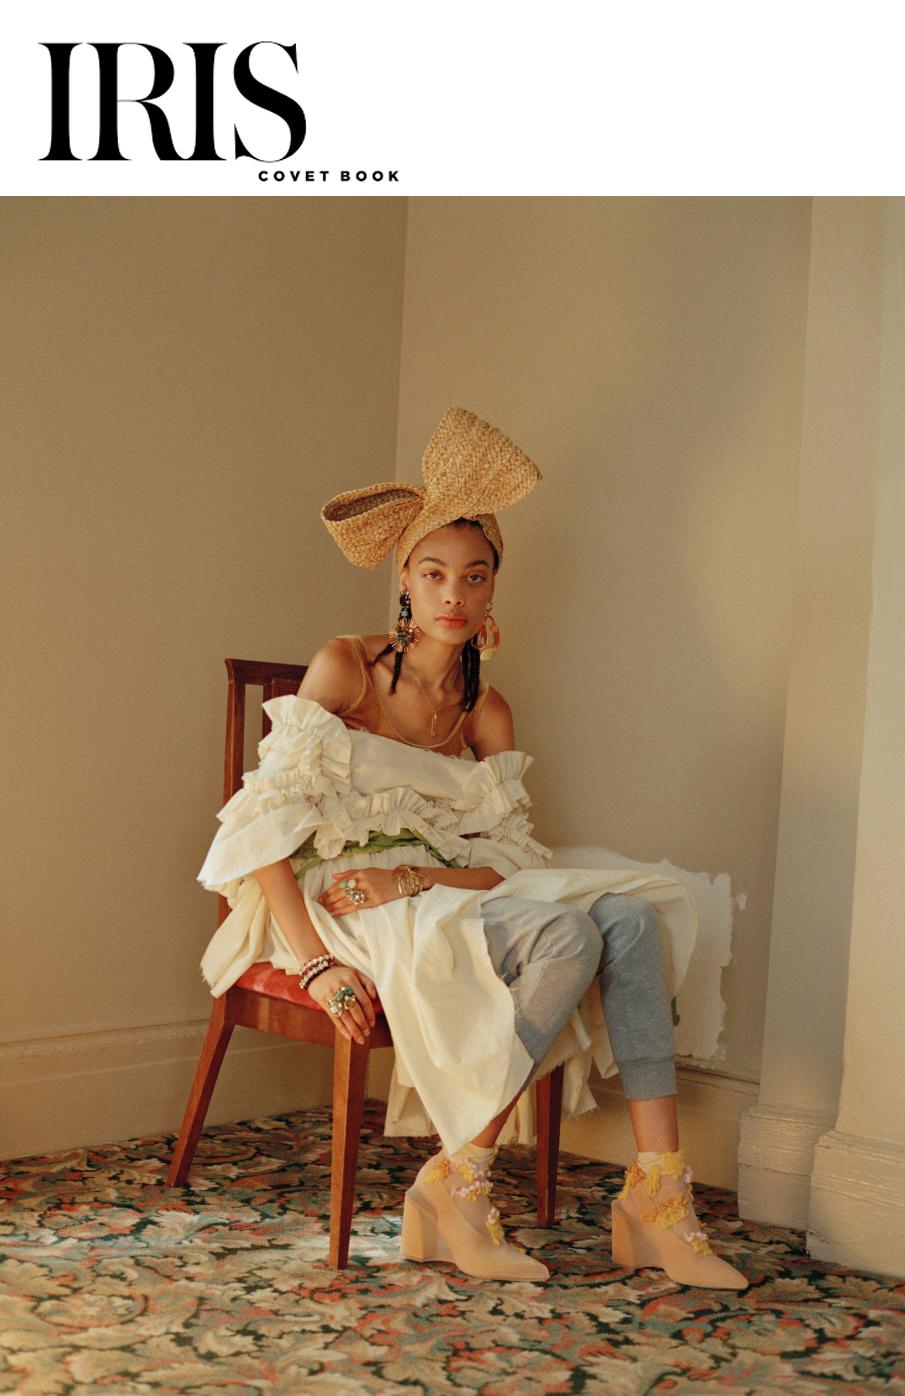 iris covet book playing house fashion editorial eaturing kelsey randall muslin ruffle angel dress